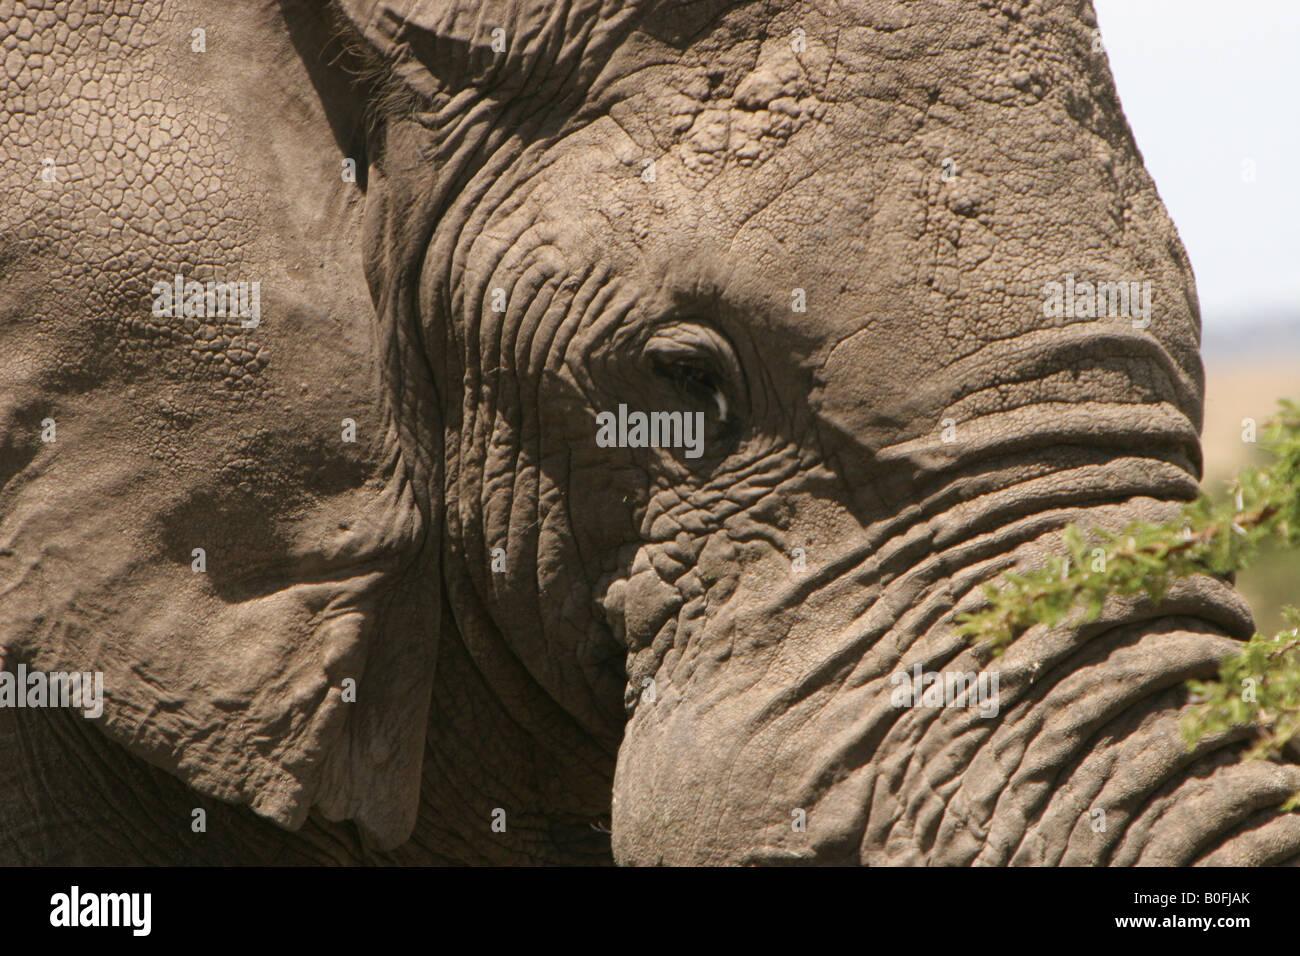 Bull elephant face close-up view in the Masai Mara Kenya East Africa - Stock Image